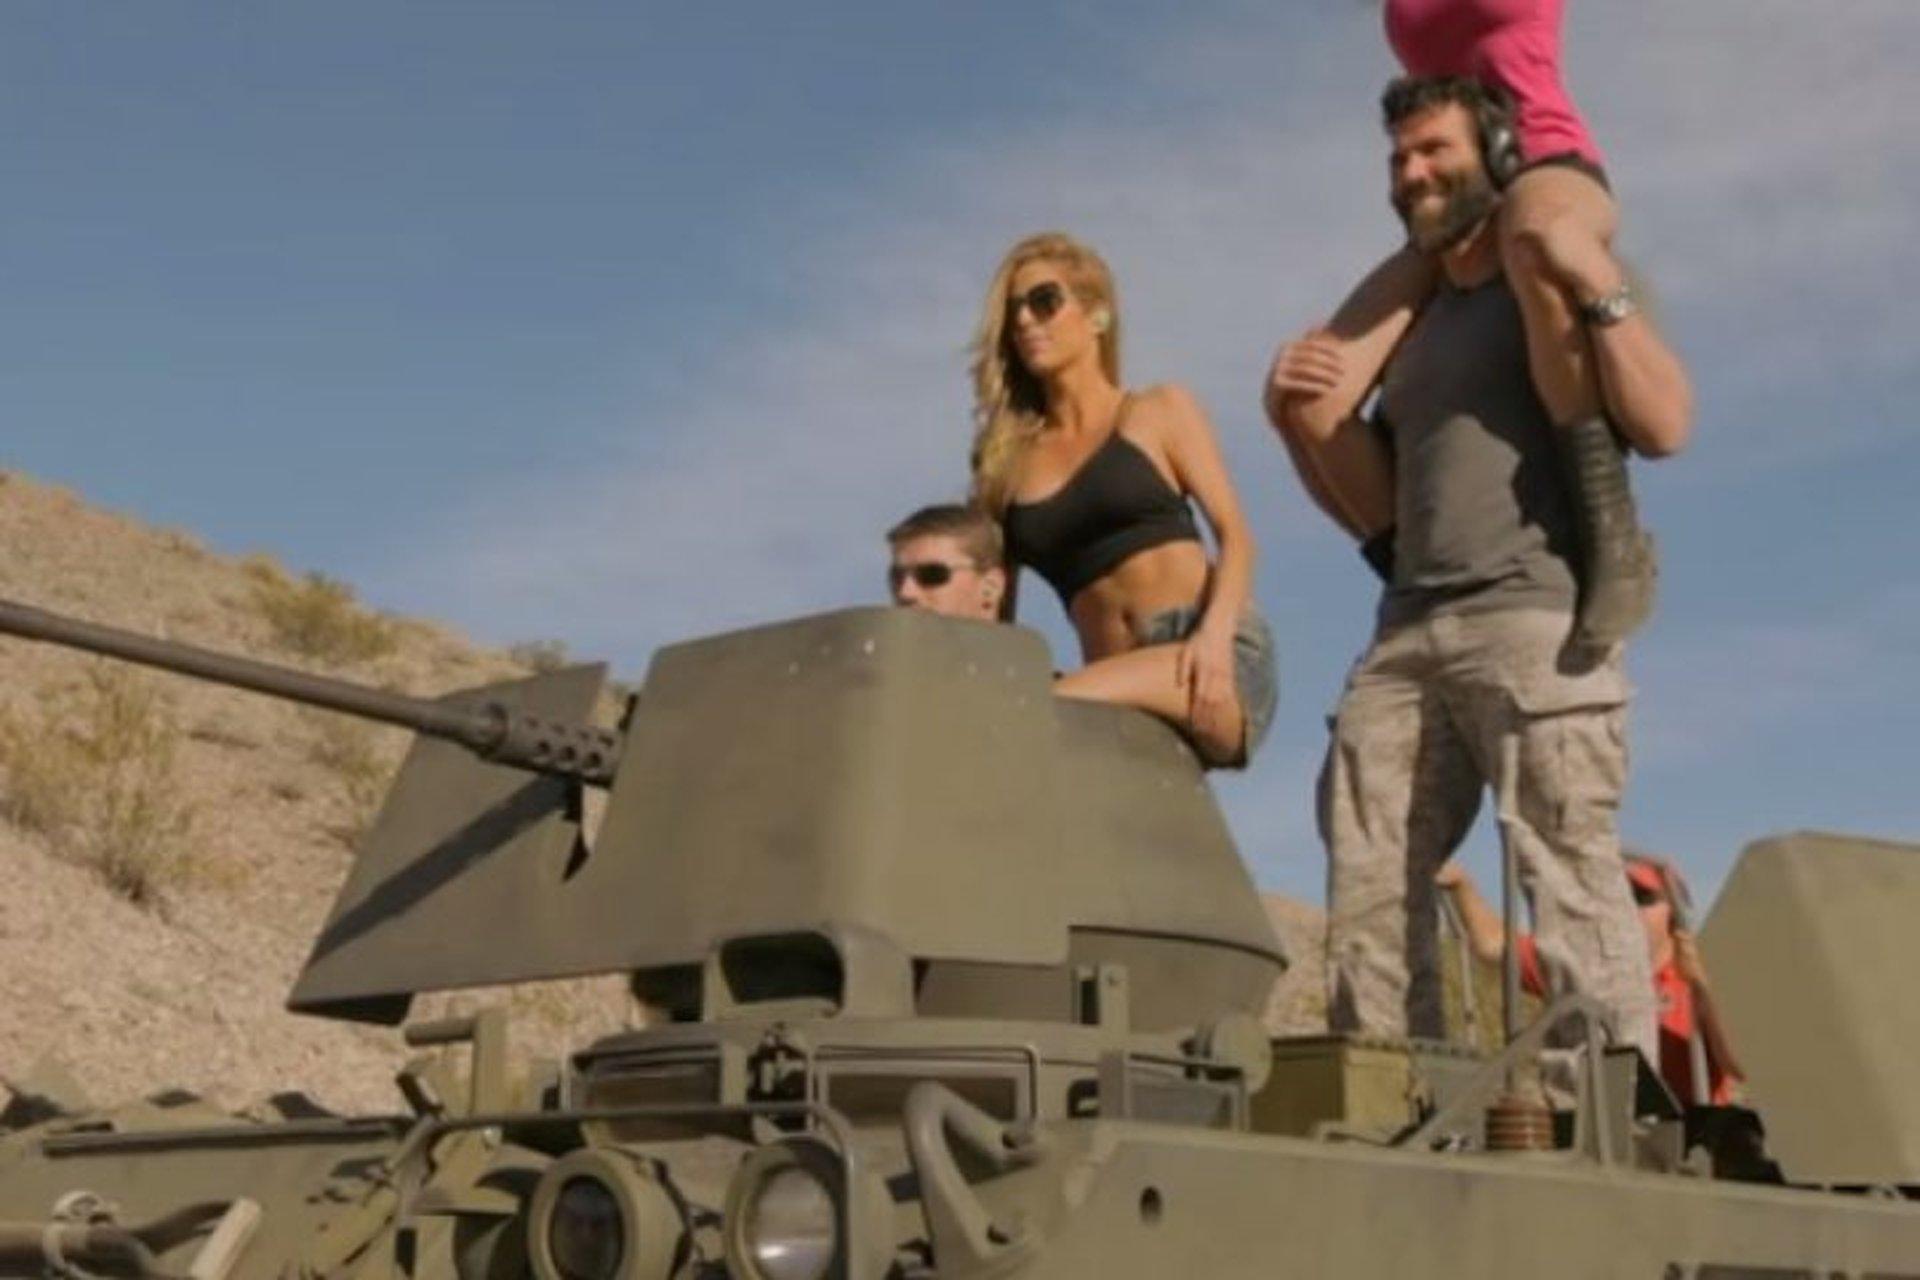 Dan Bilzerian Shoots Guns, Drives Tanks, Surrounds Himself With Women [Video]